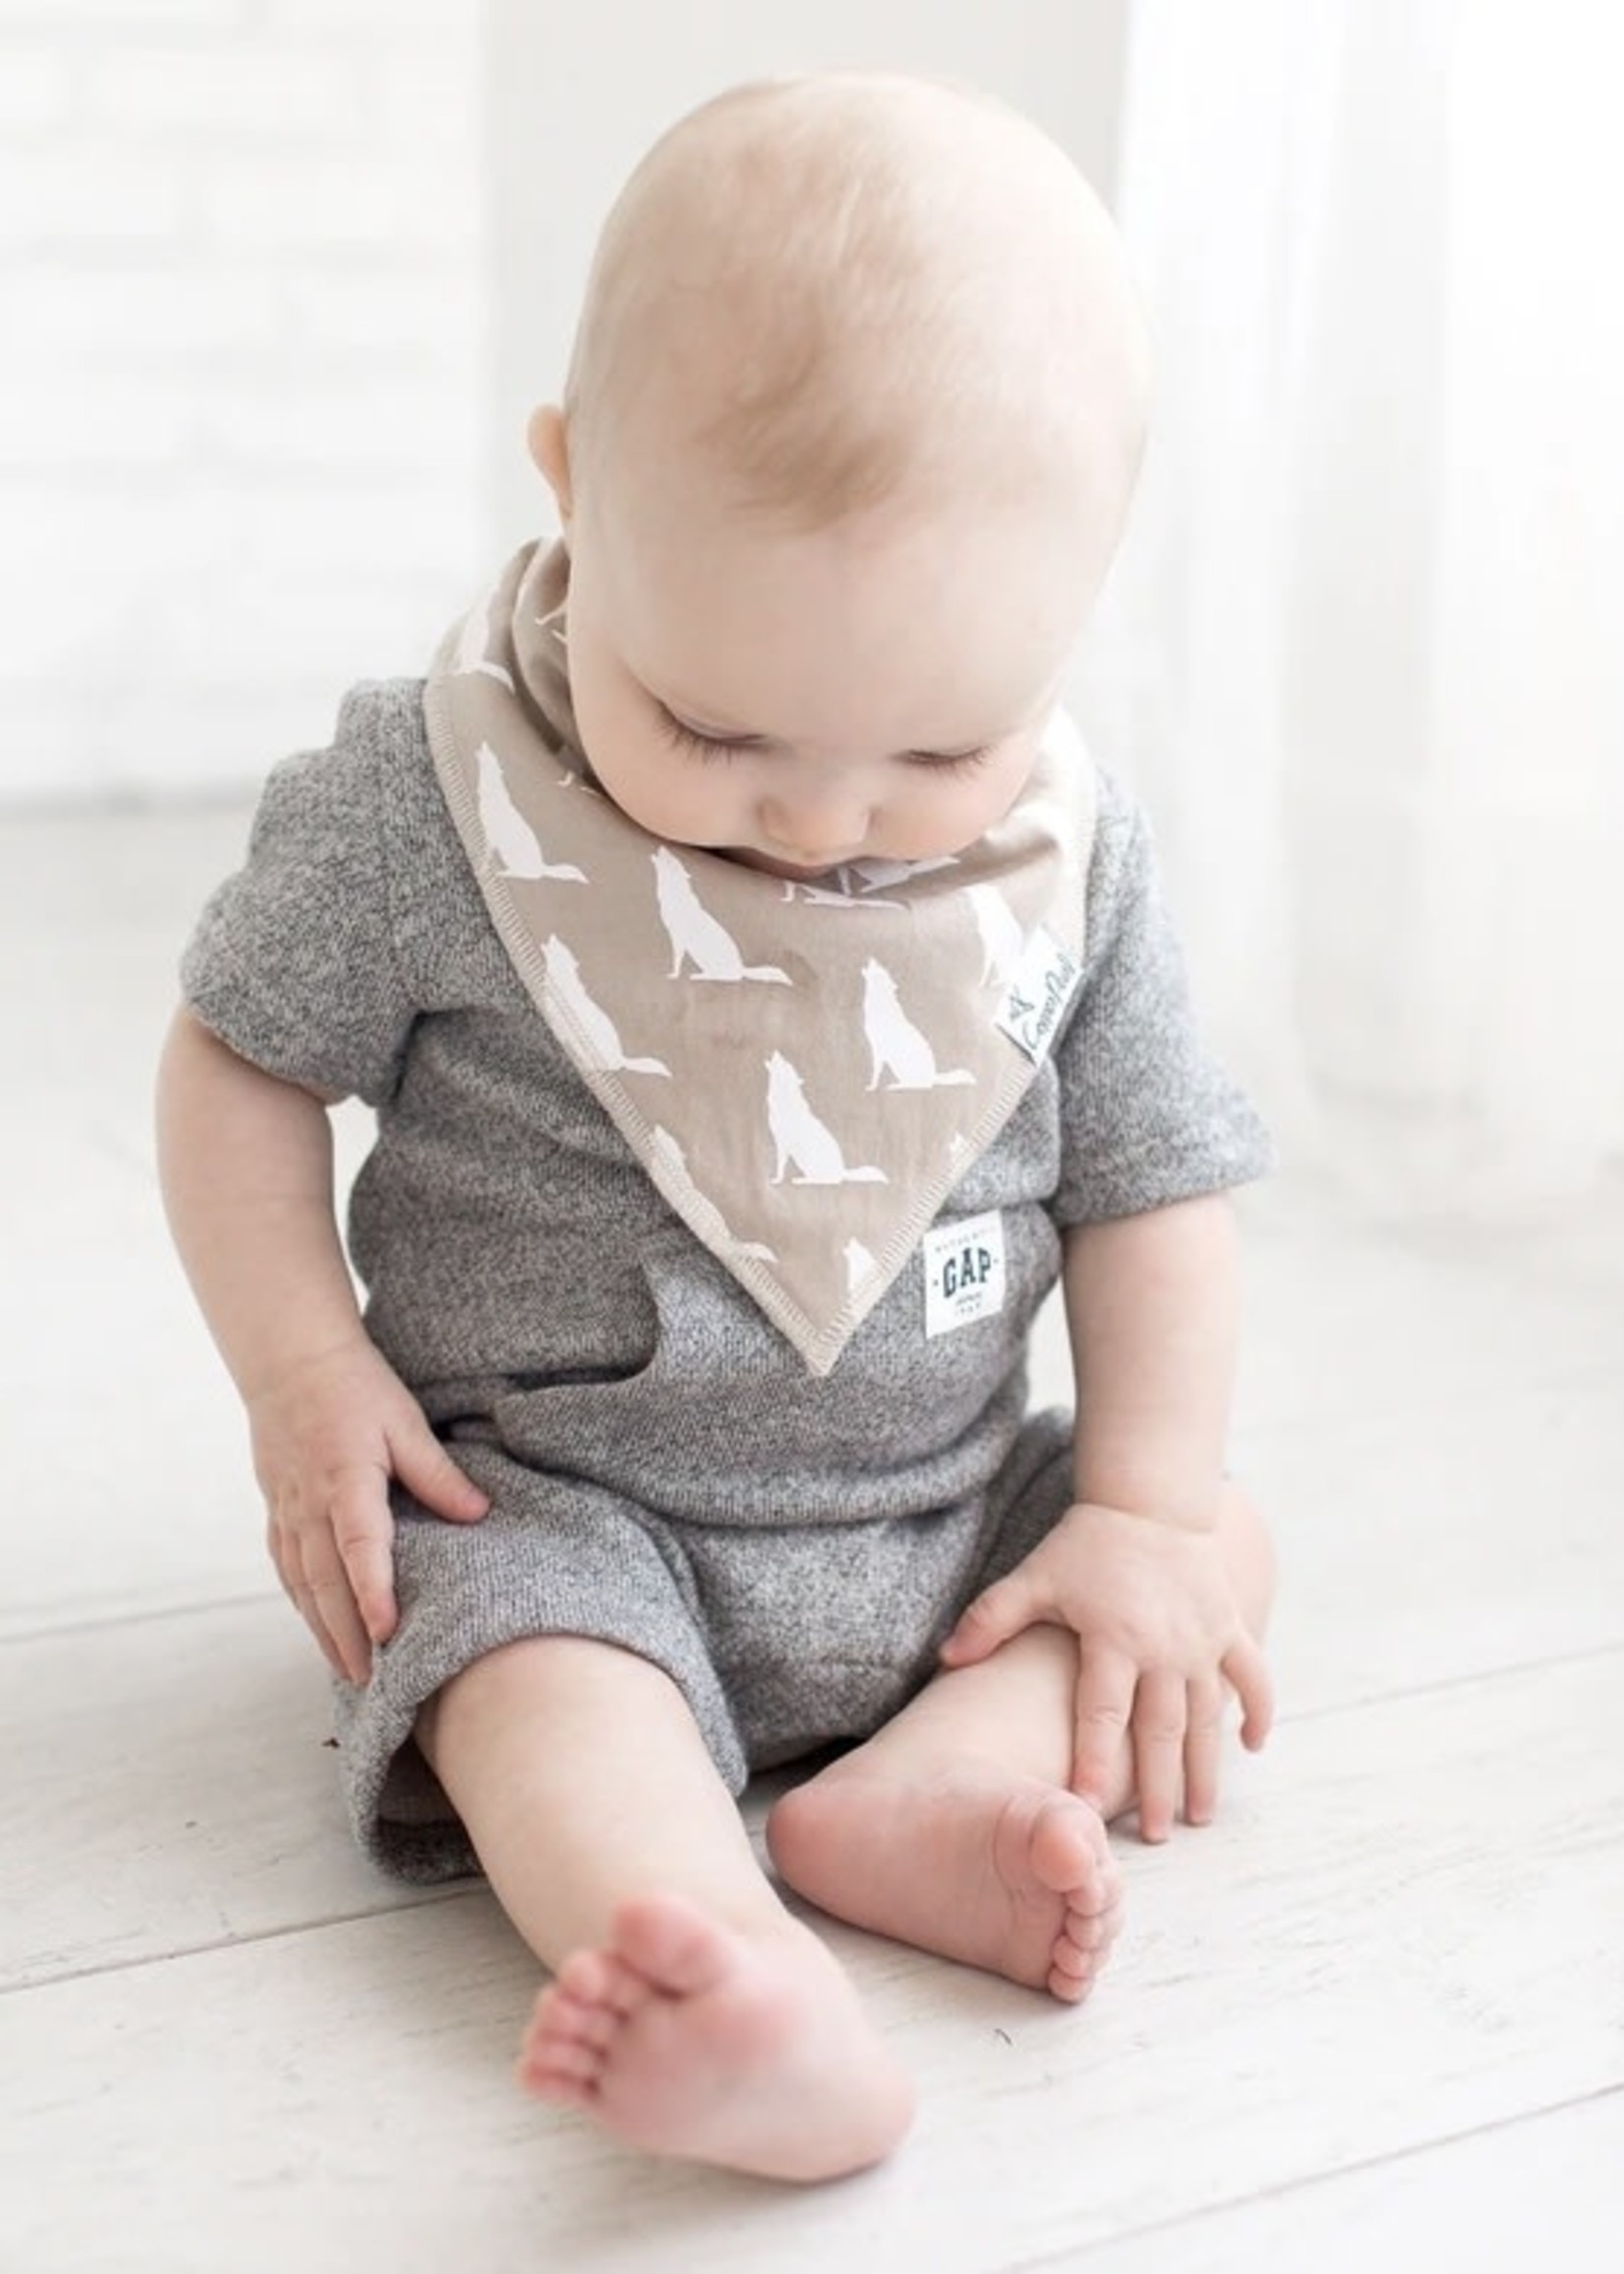 COPPER PEARL 4-pack Baby Bandana Bibs - PHOENIX